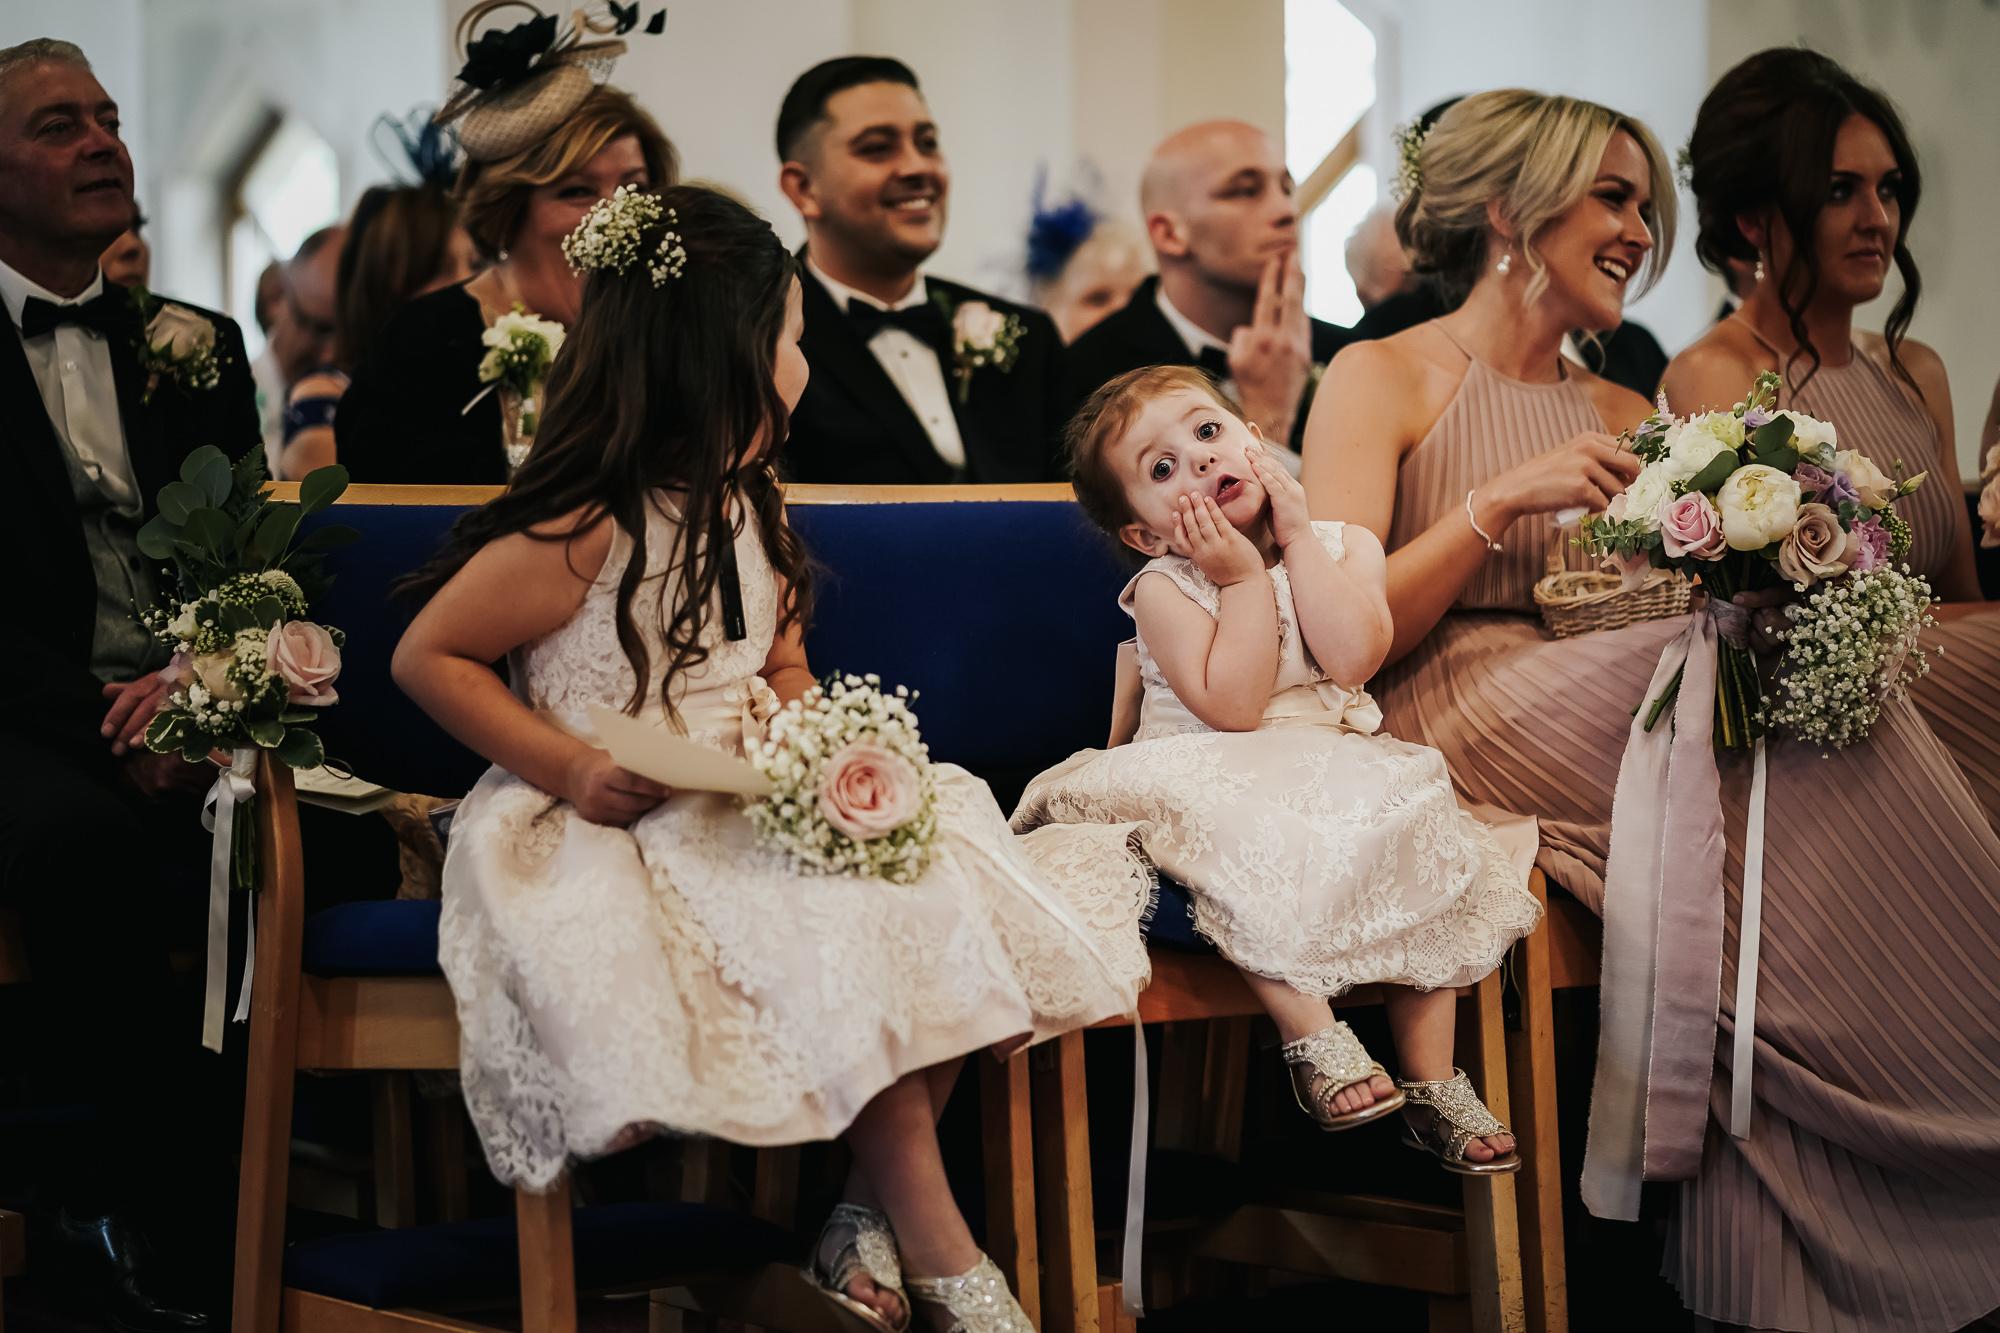 The Hayloft Wedding Photography Cheshire wedding photographer (21 of 52).jpg